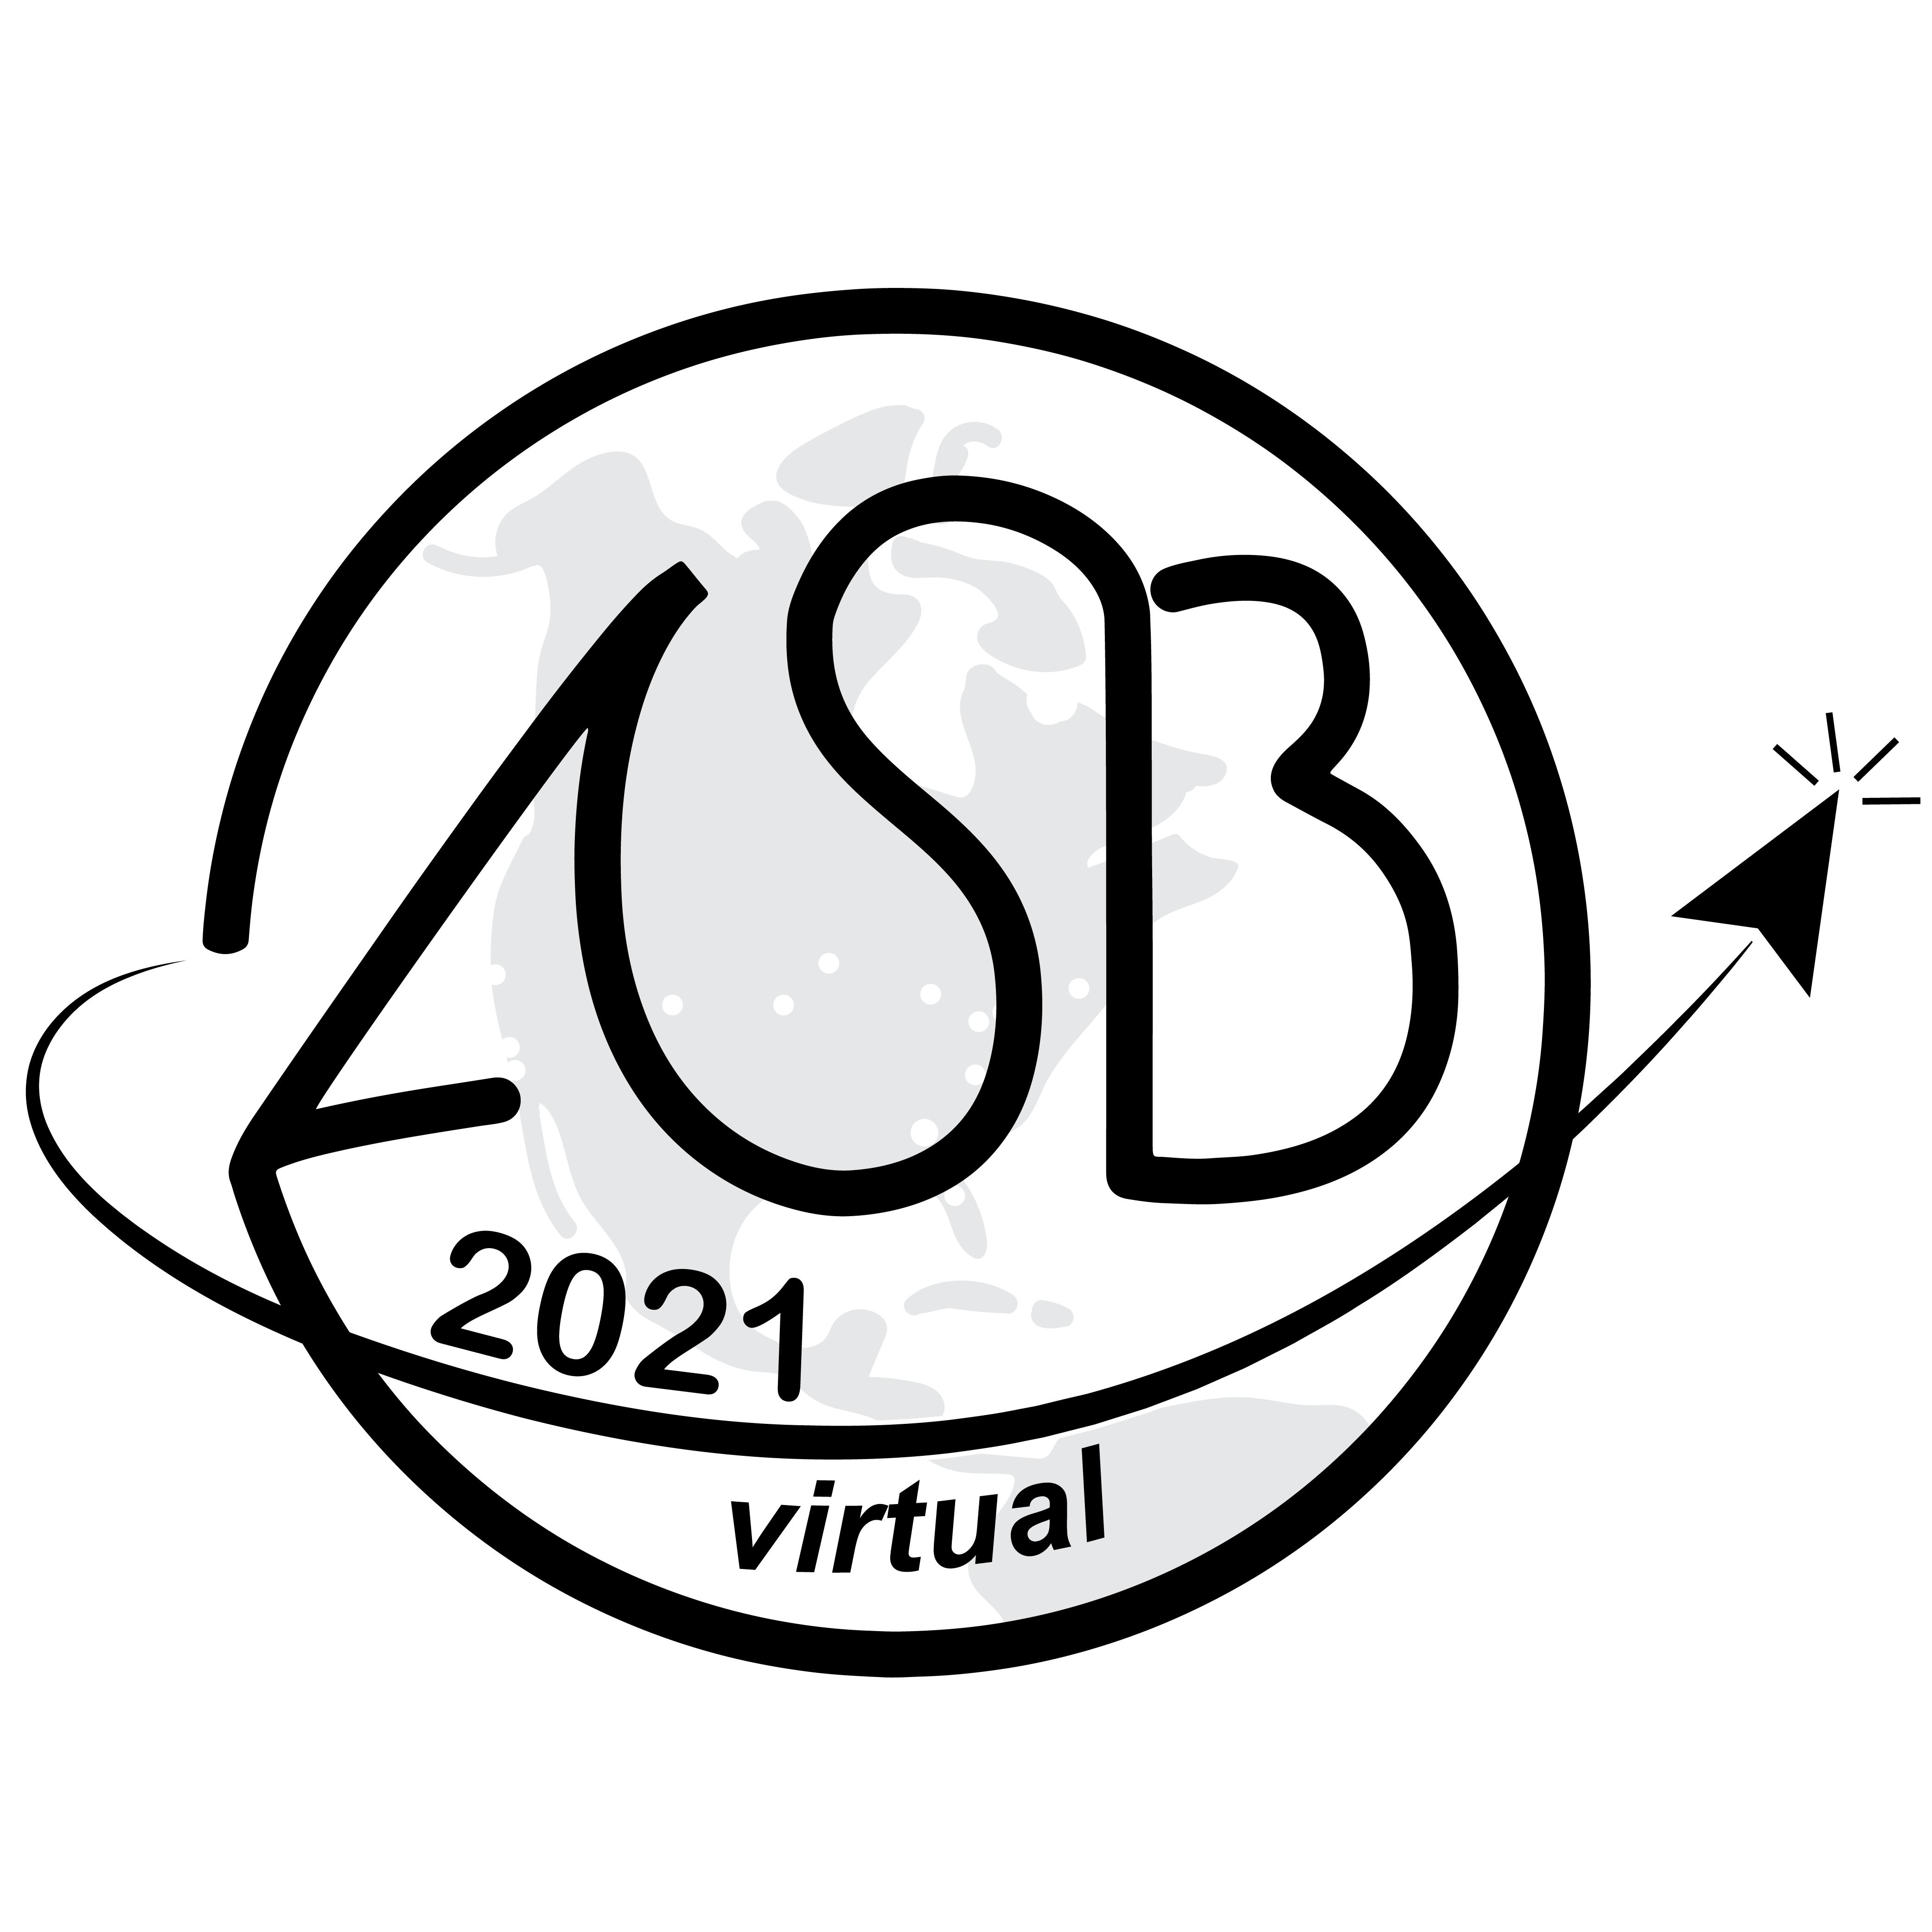 asb 2021 logoglobe3